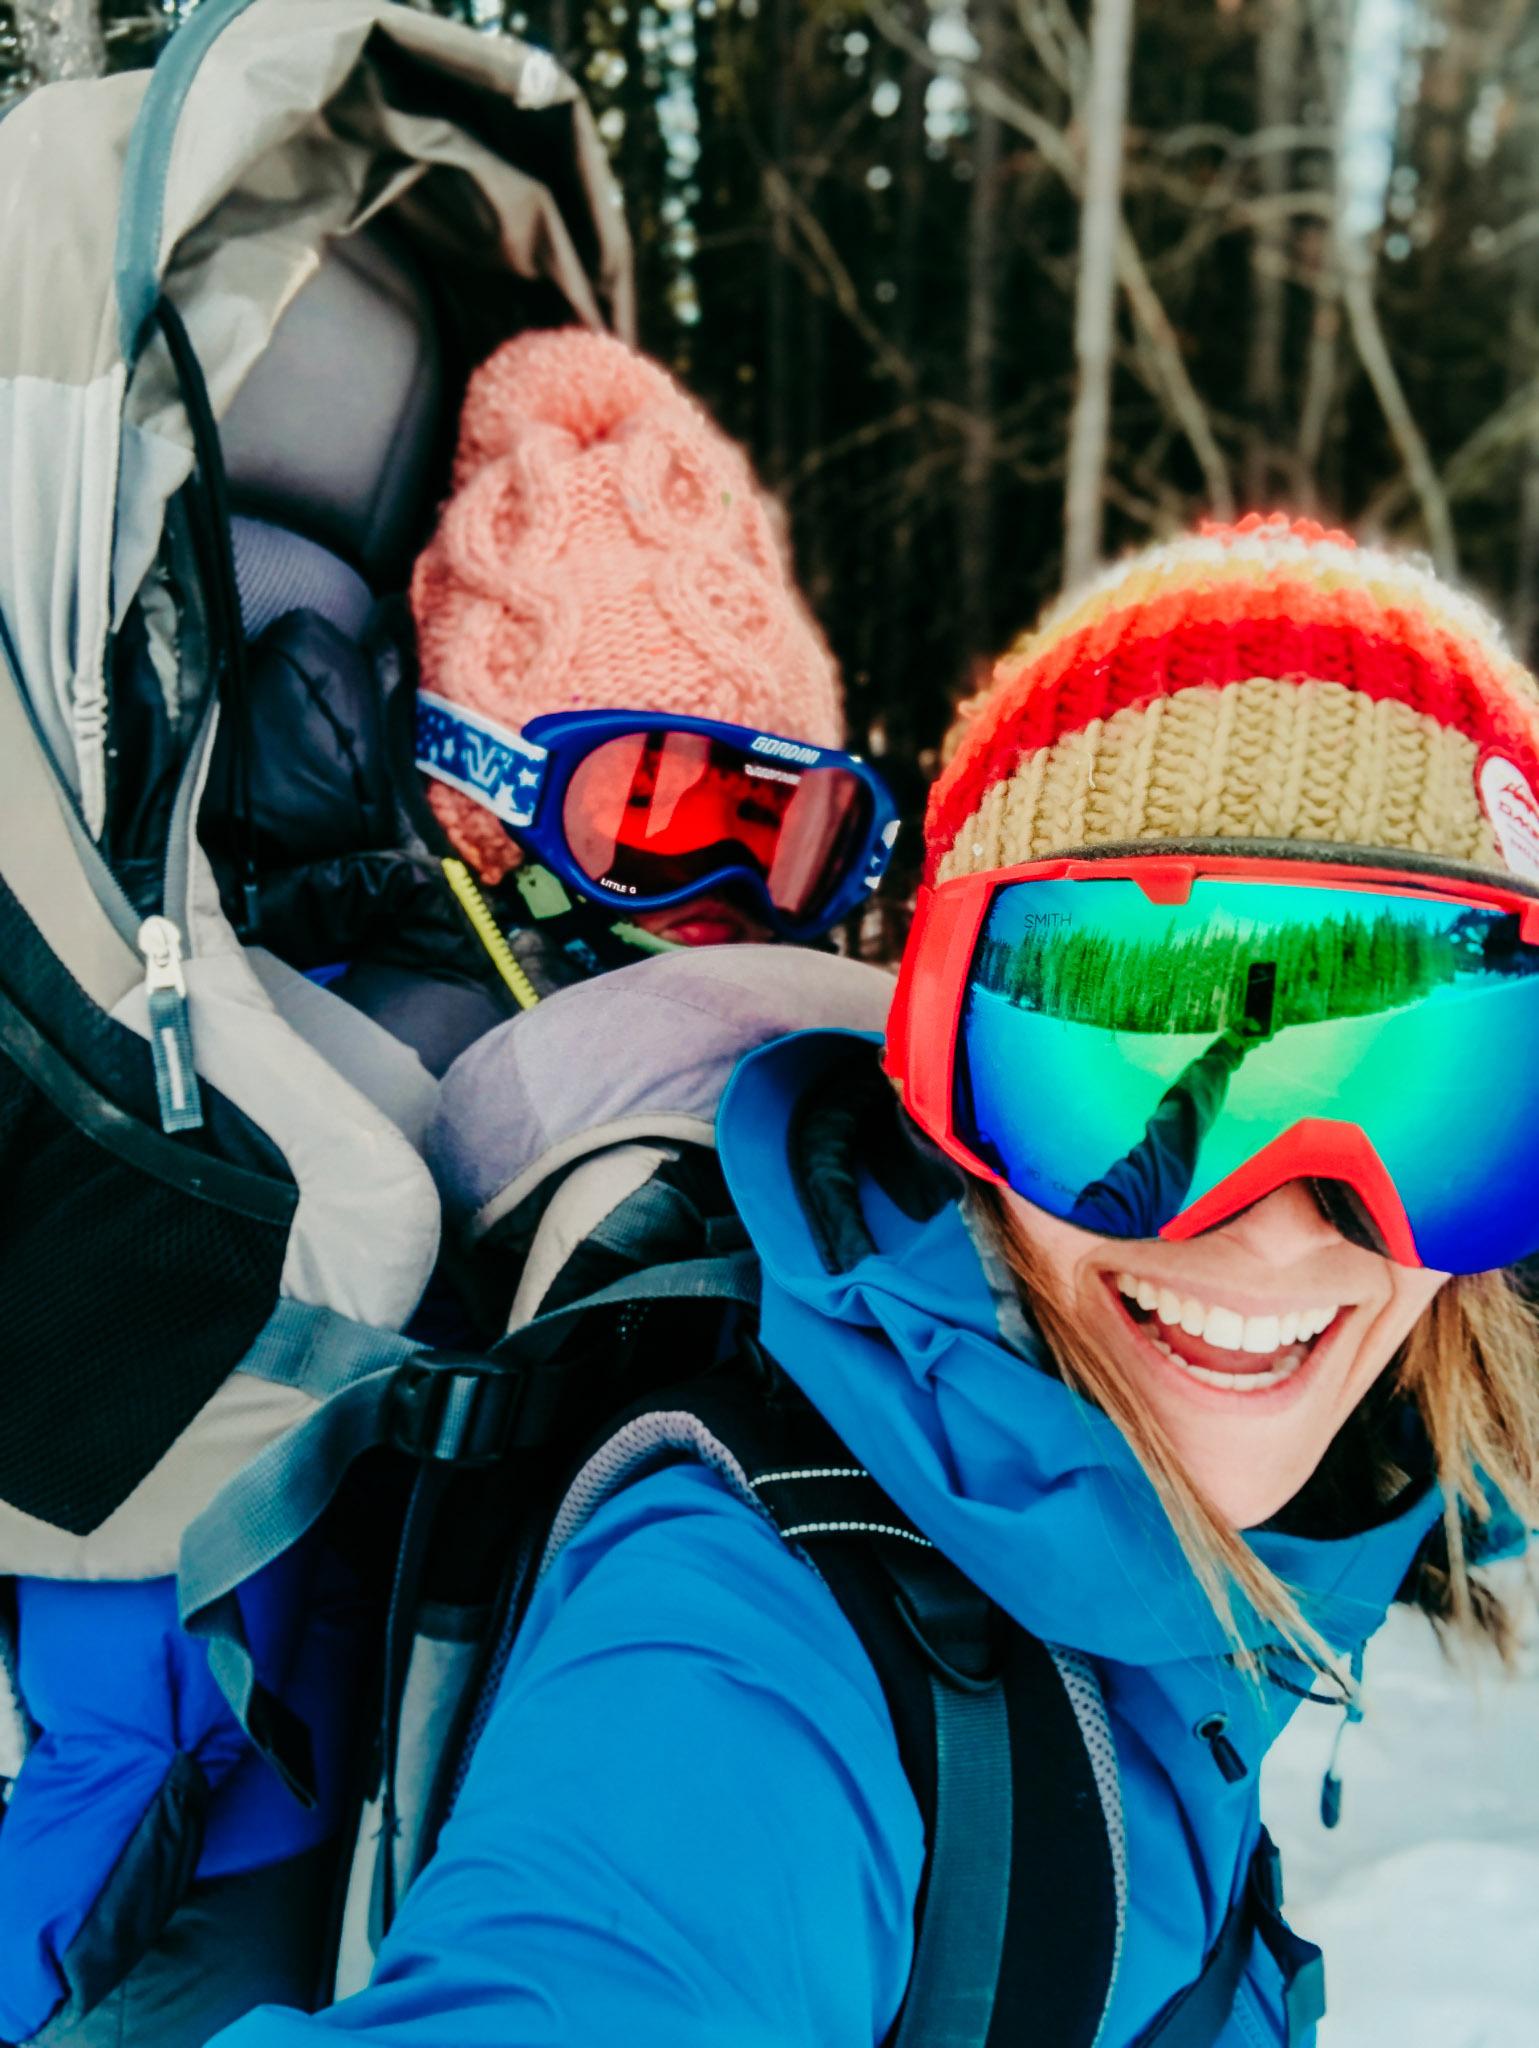 Chelsea Czibere - January 19, 2018 - Nakiska Ski Resort-1.jpg